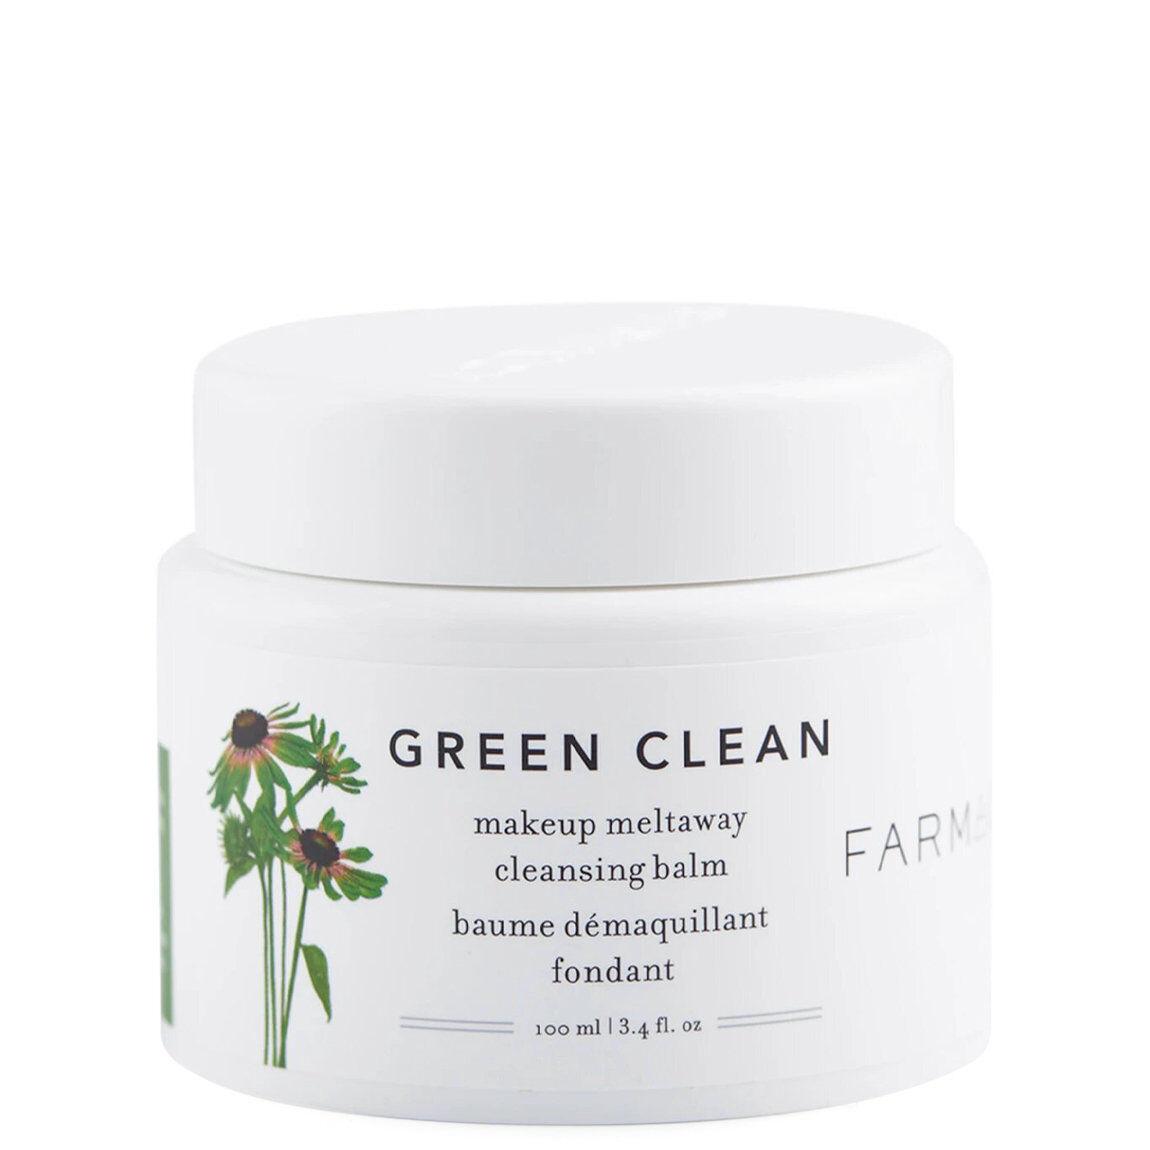 Farmacy - Green Clean Makeup Meltaway Cleansing Balm